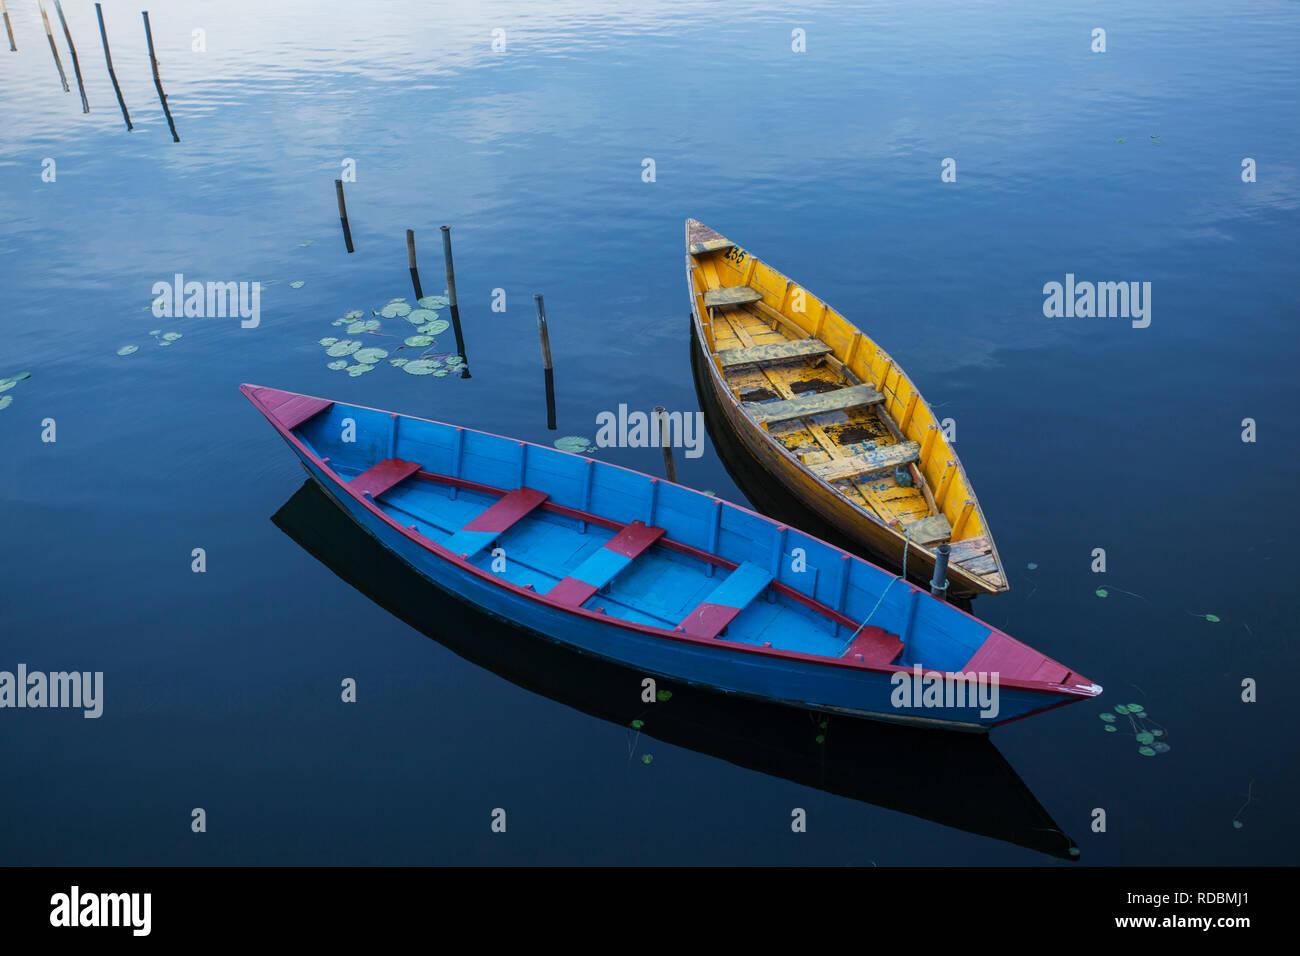 Boats in Begnas lake in Pokhara, Nepal. - Stock Image